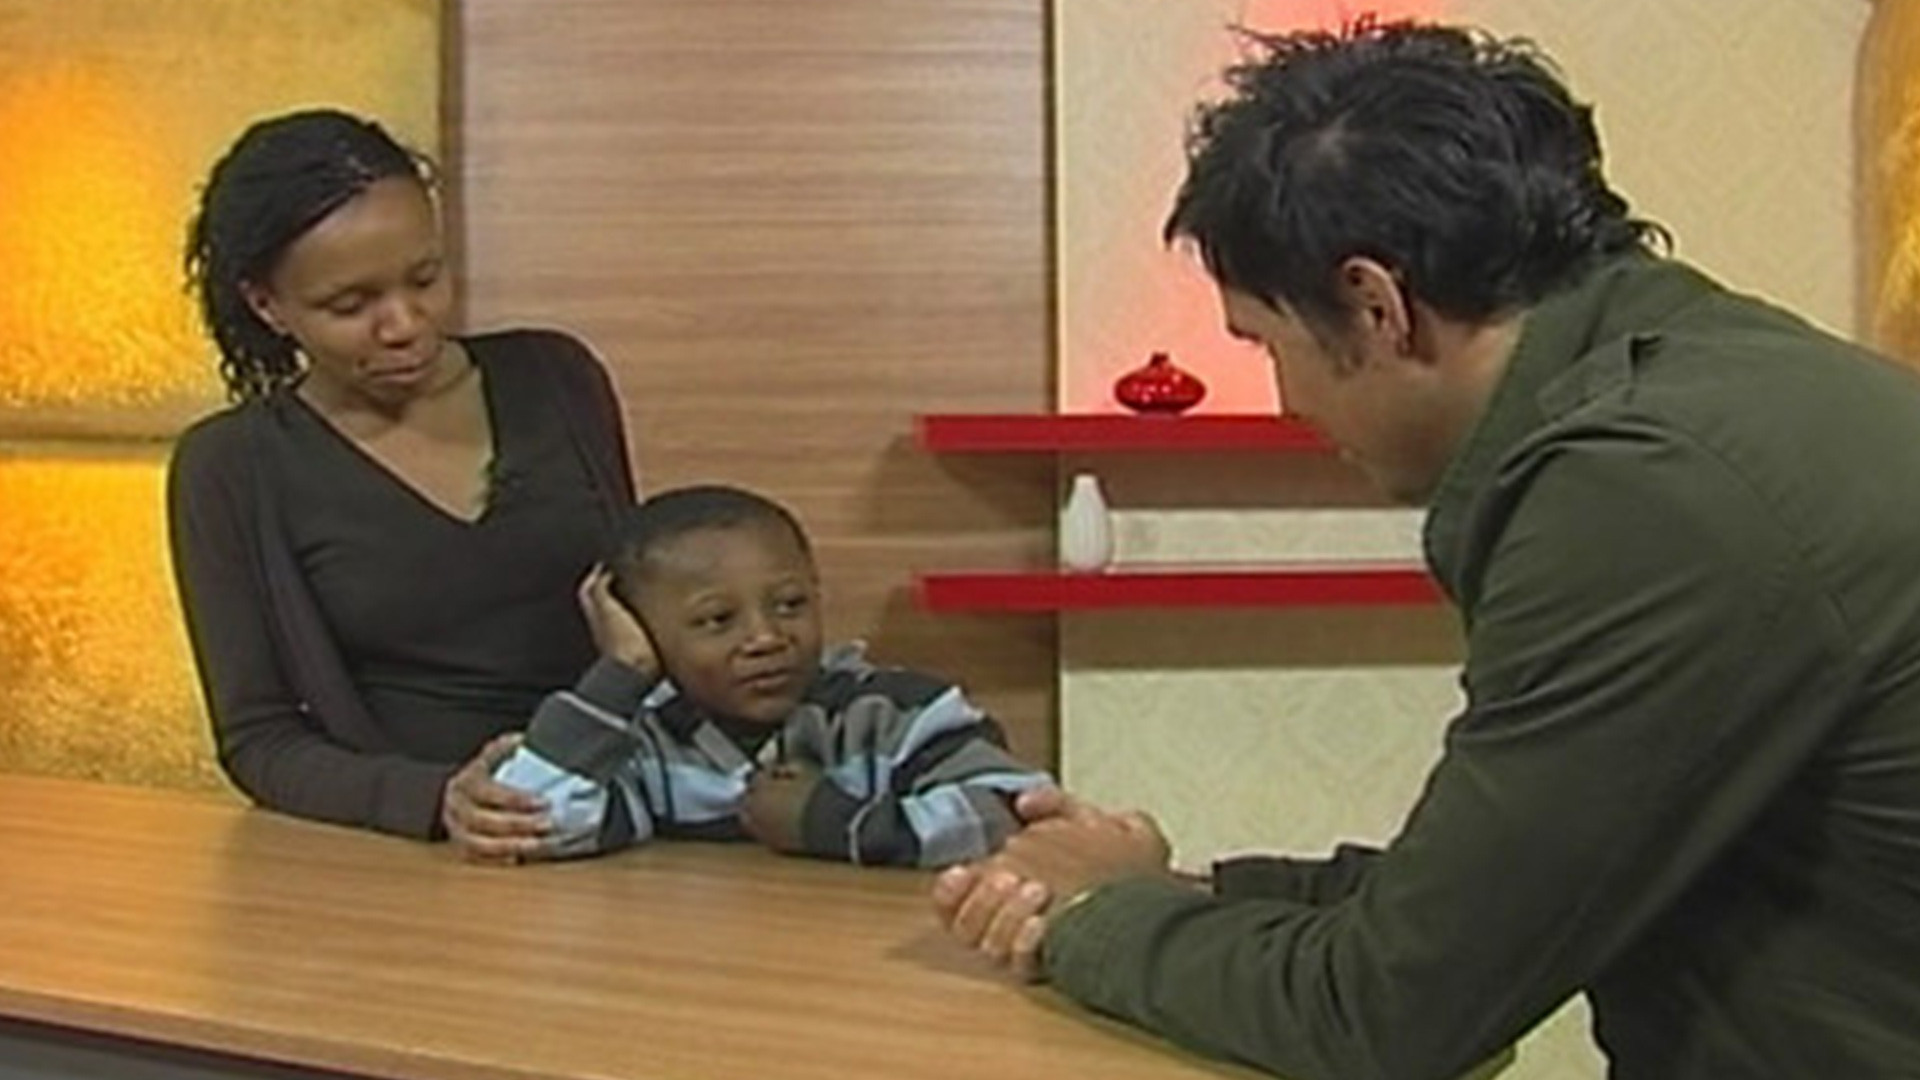 Afrika - Hilfe für Kinder